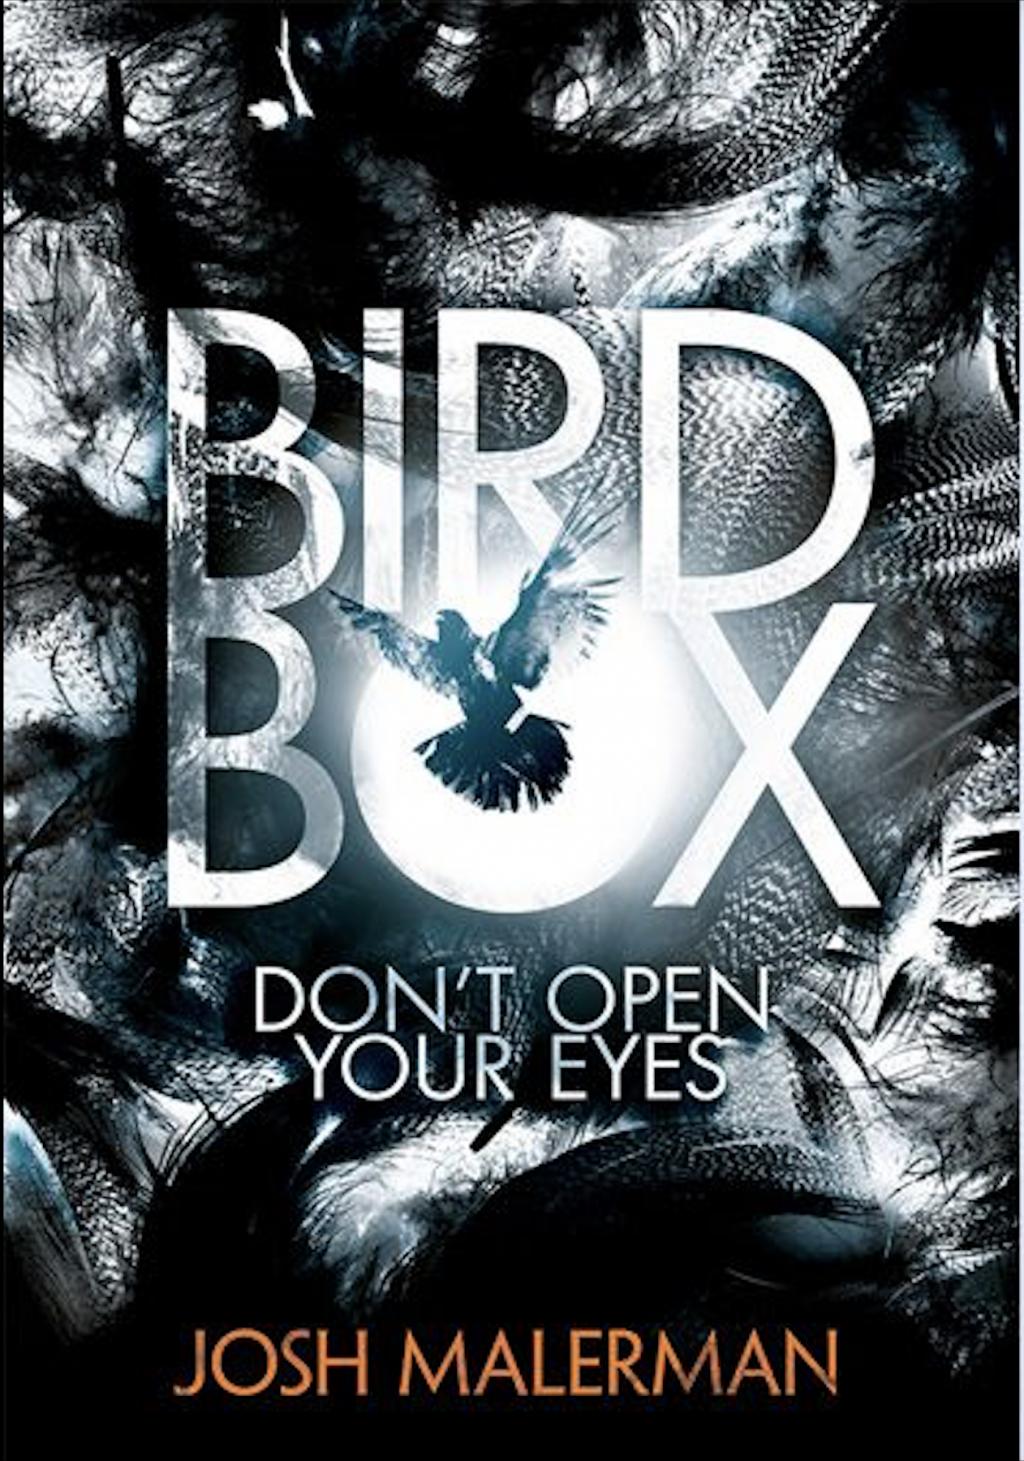 Netflix hits home run with 'Bird Box'